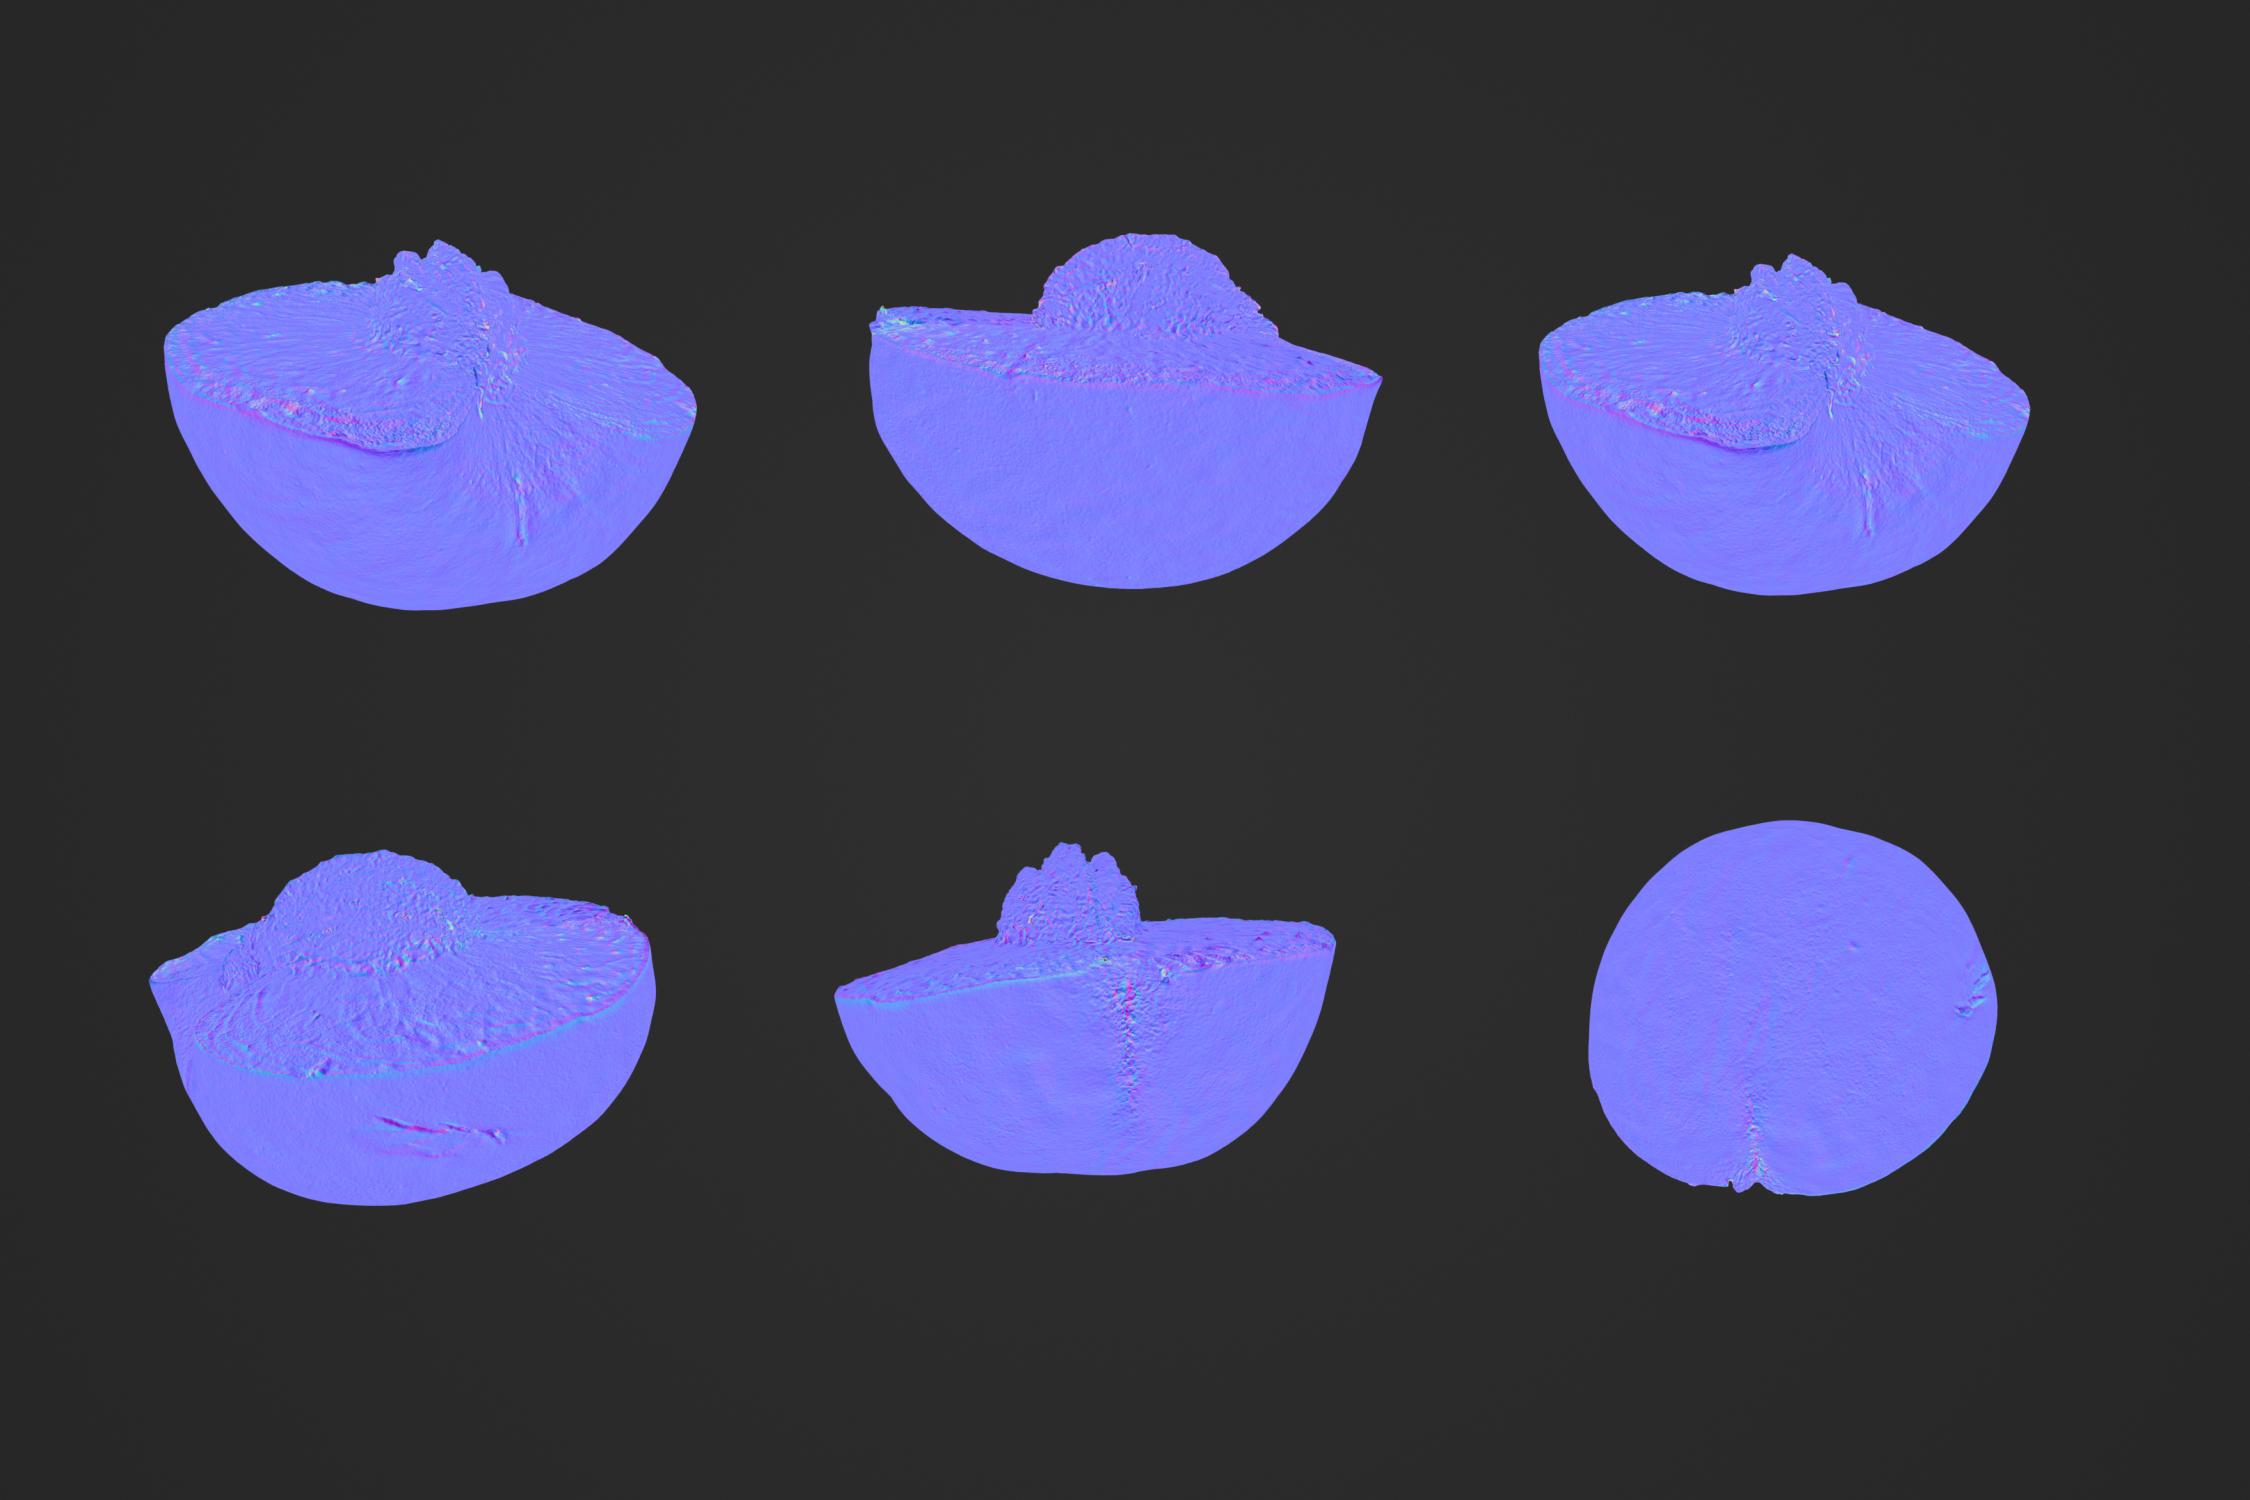 Half_Peach_2_3.jpg